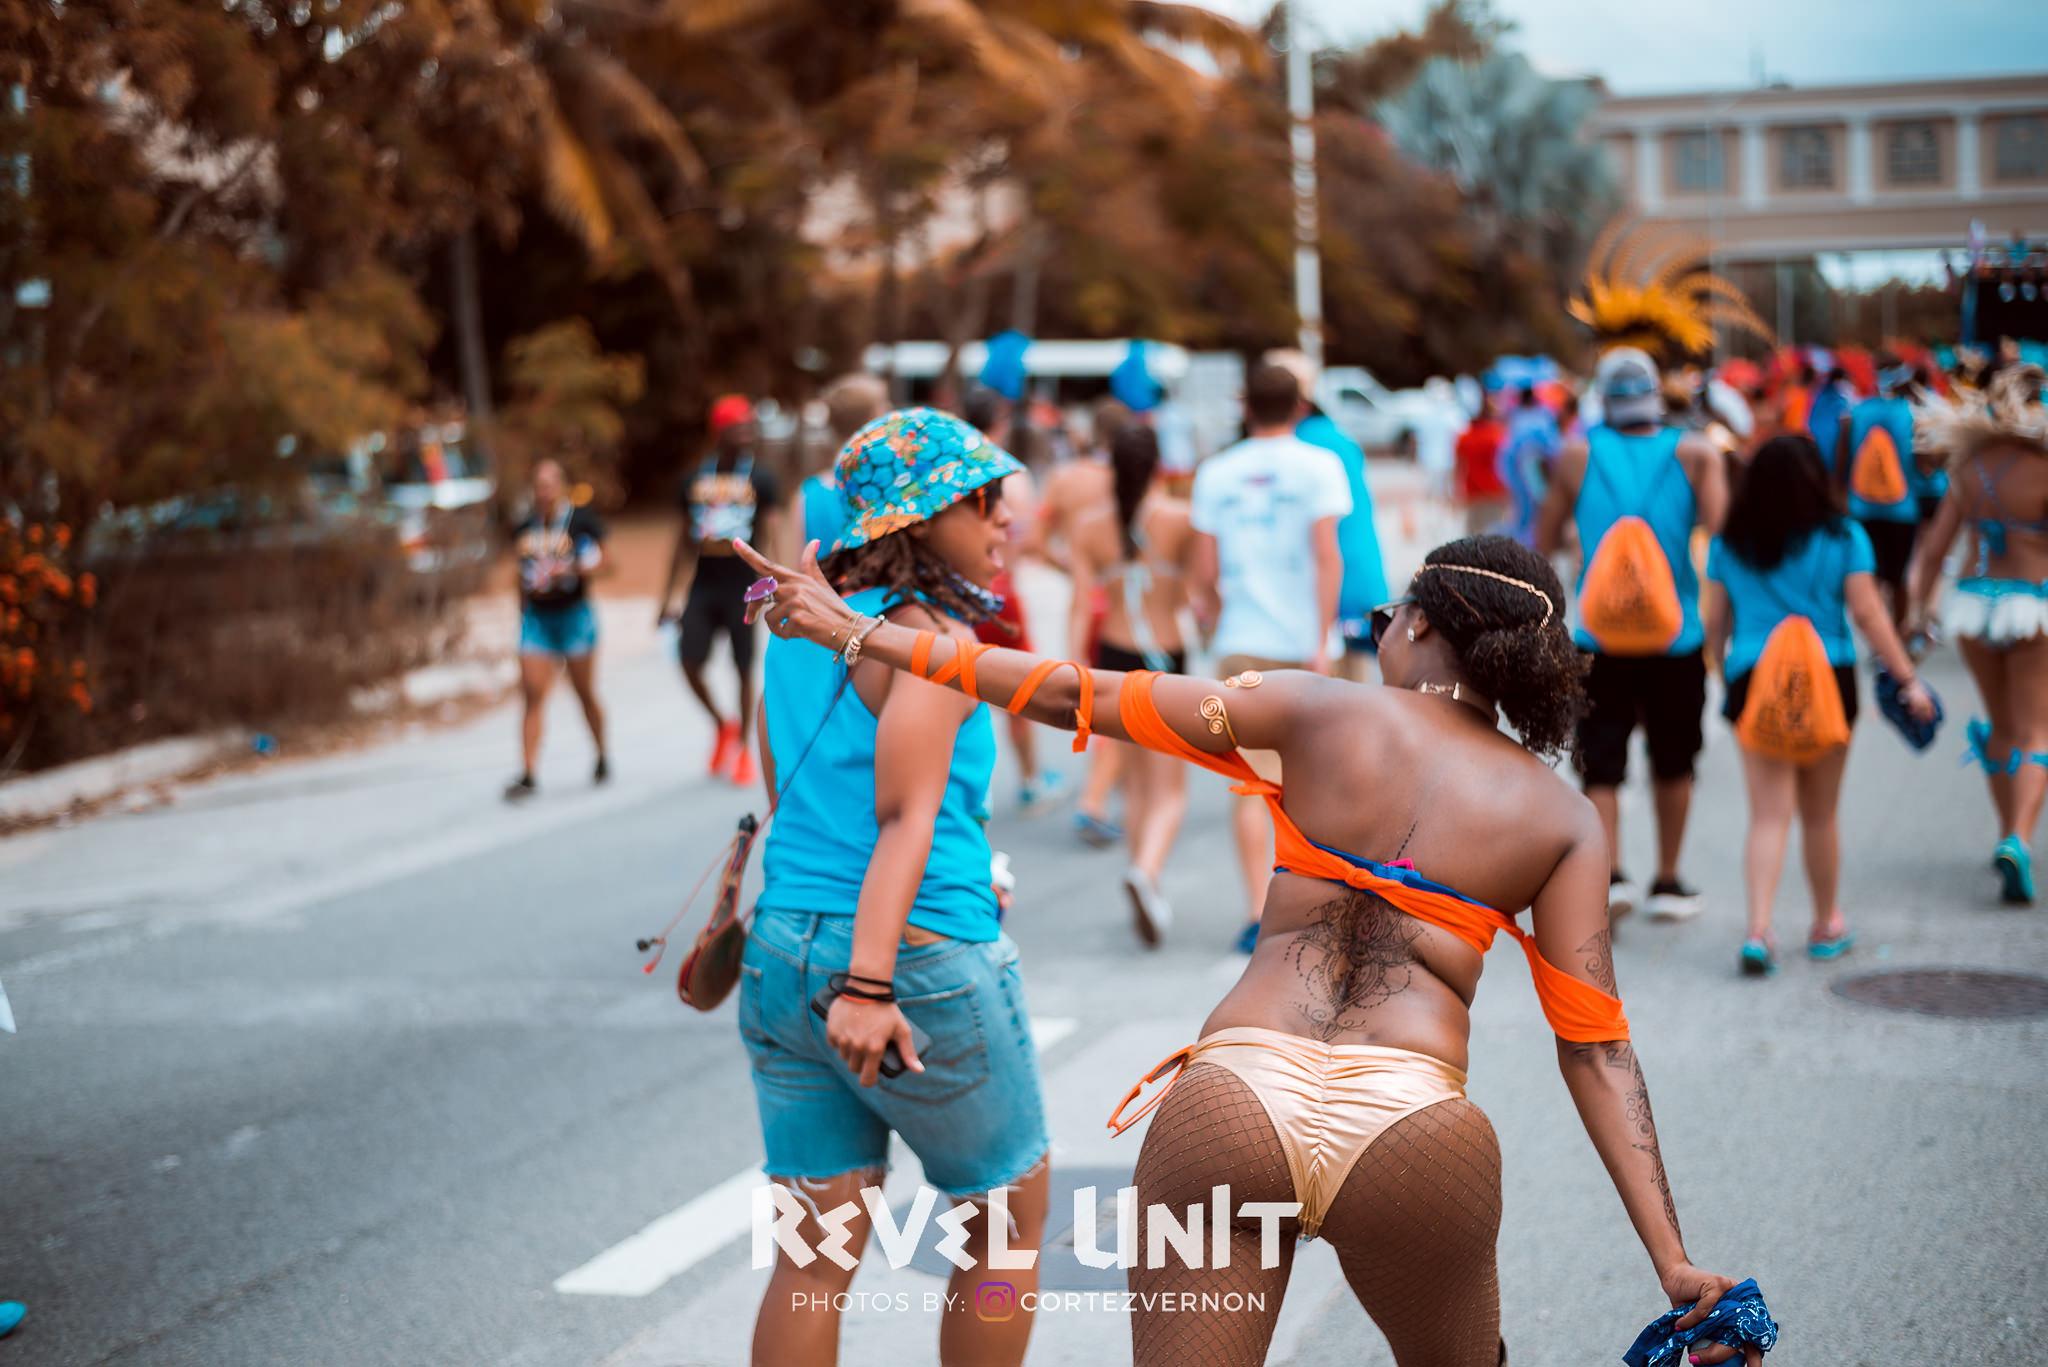 Revel Unit - Batabano 2017 (1).jpg